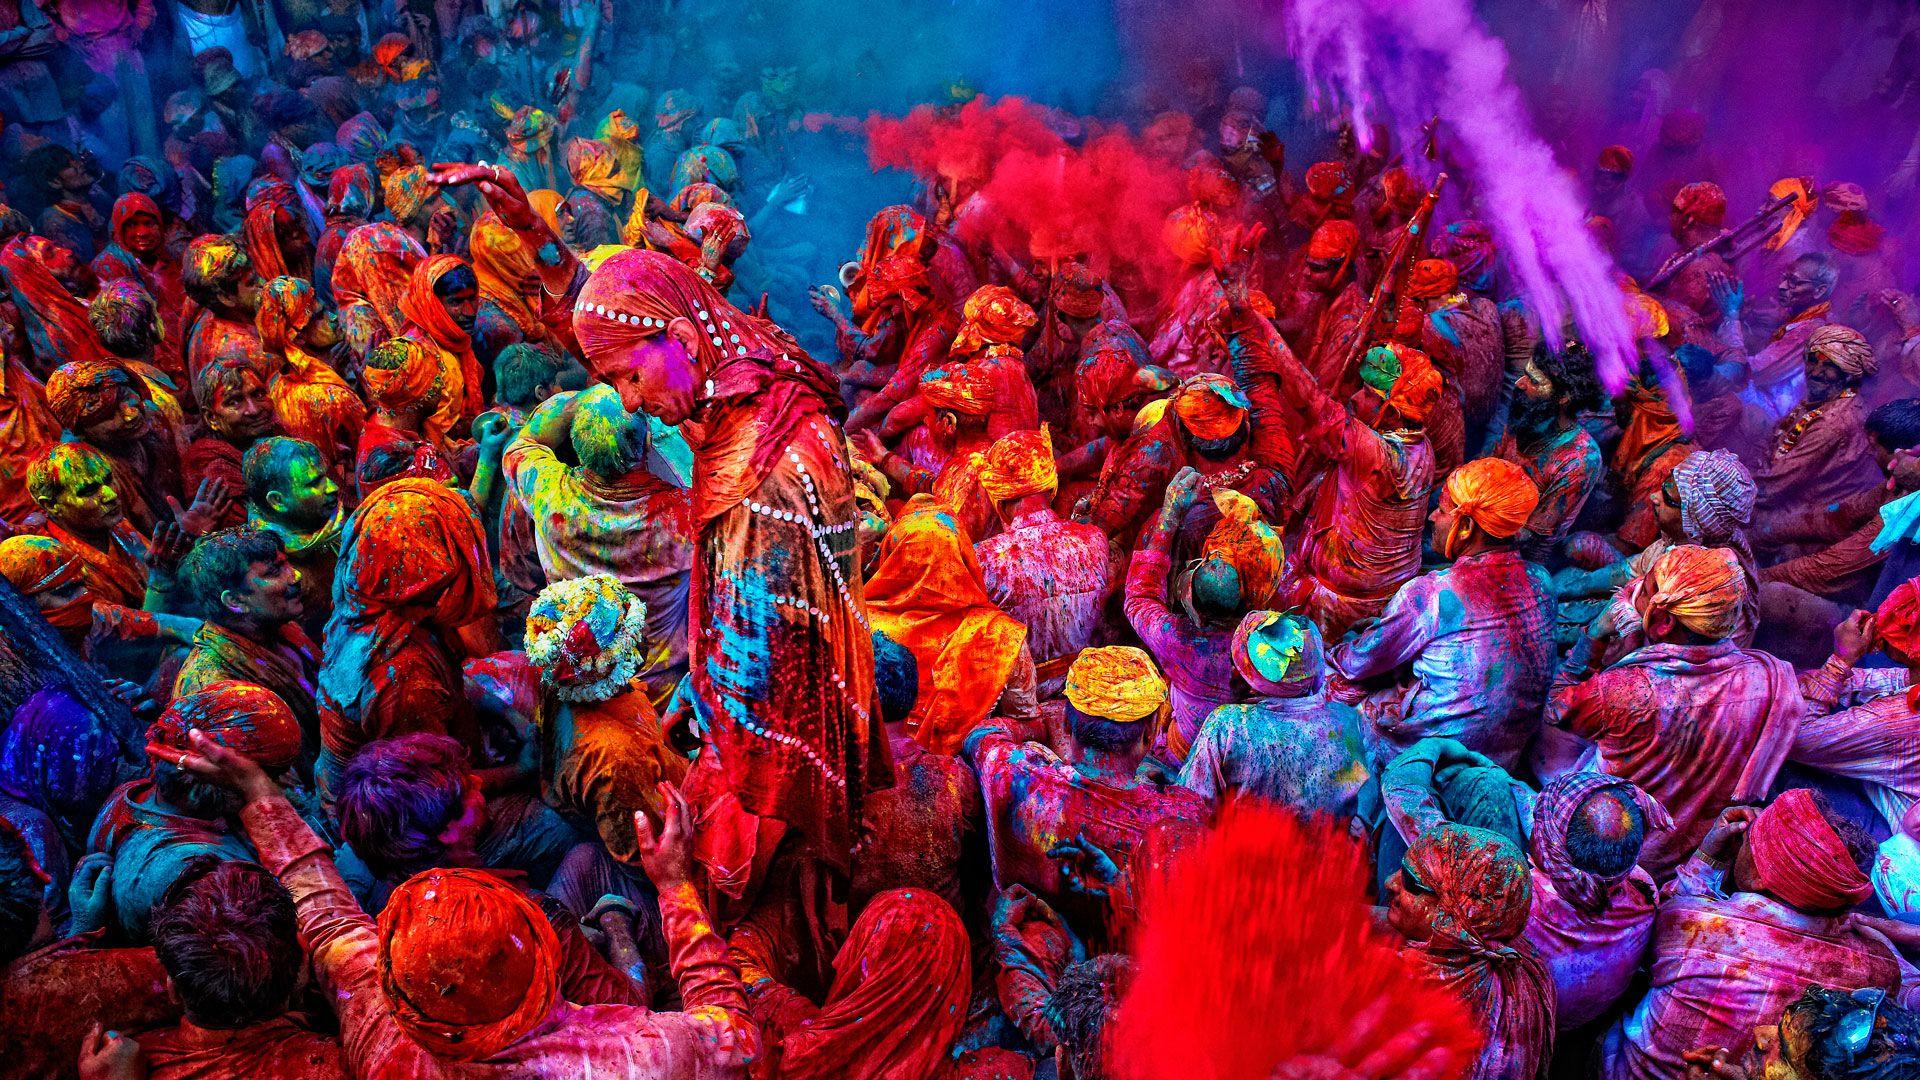 Pin By B2b Hospitality On Bucket List Holi Festival Of Colours Holi Festival India Holi Colors